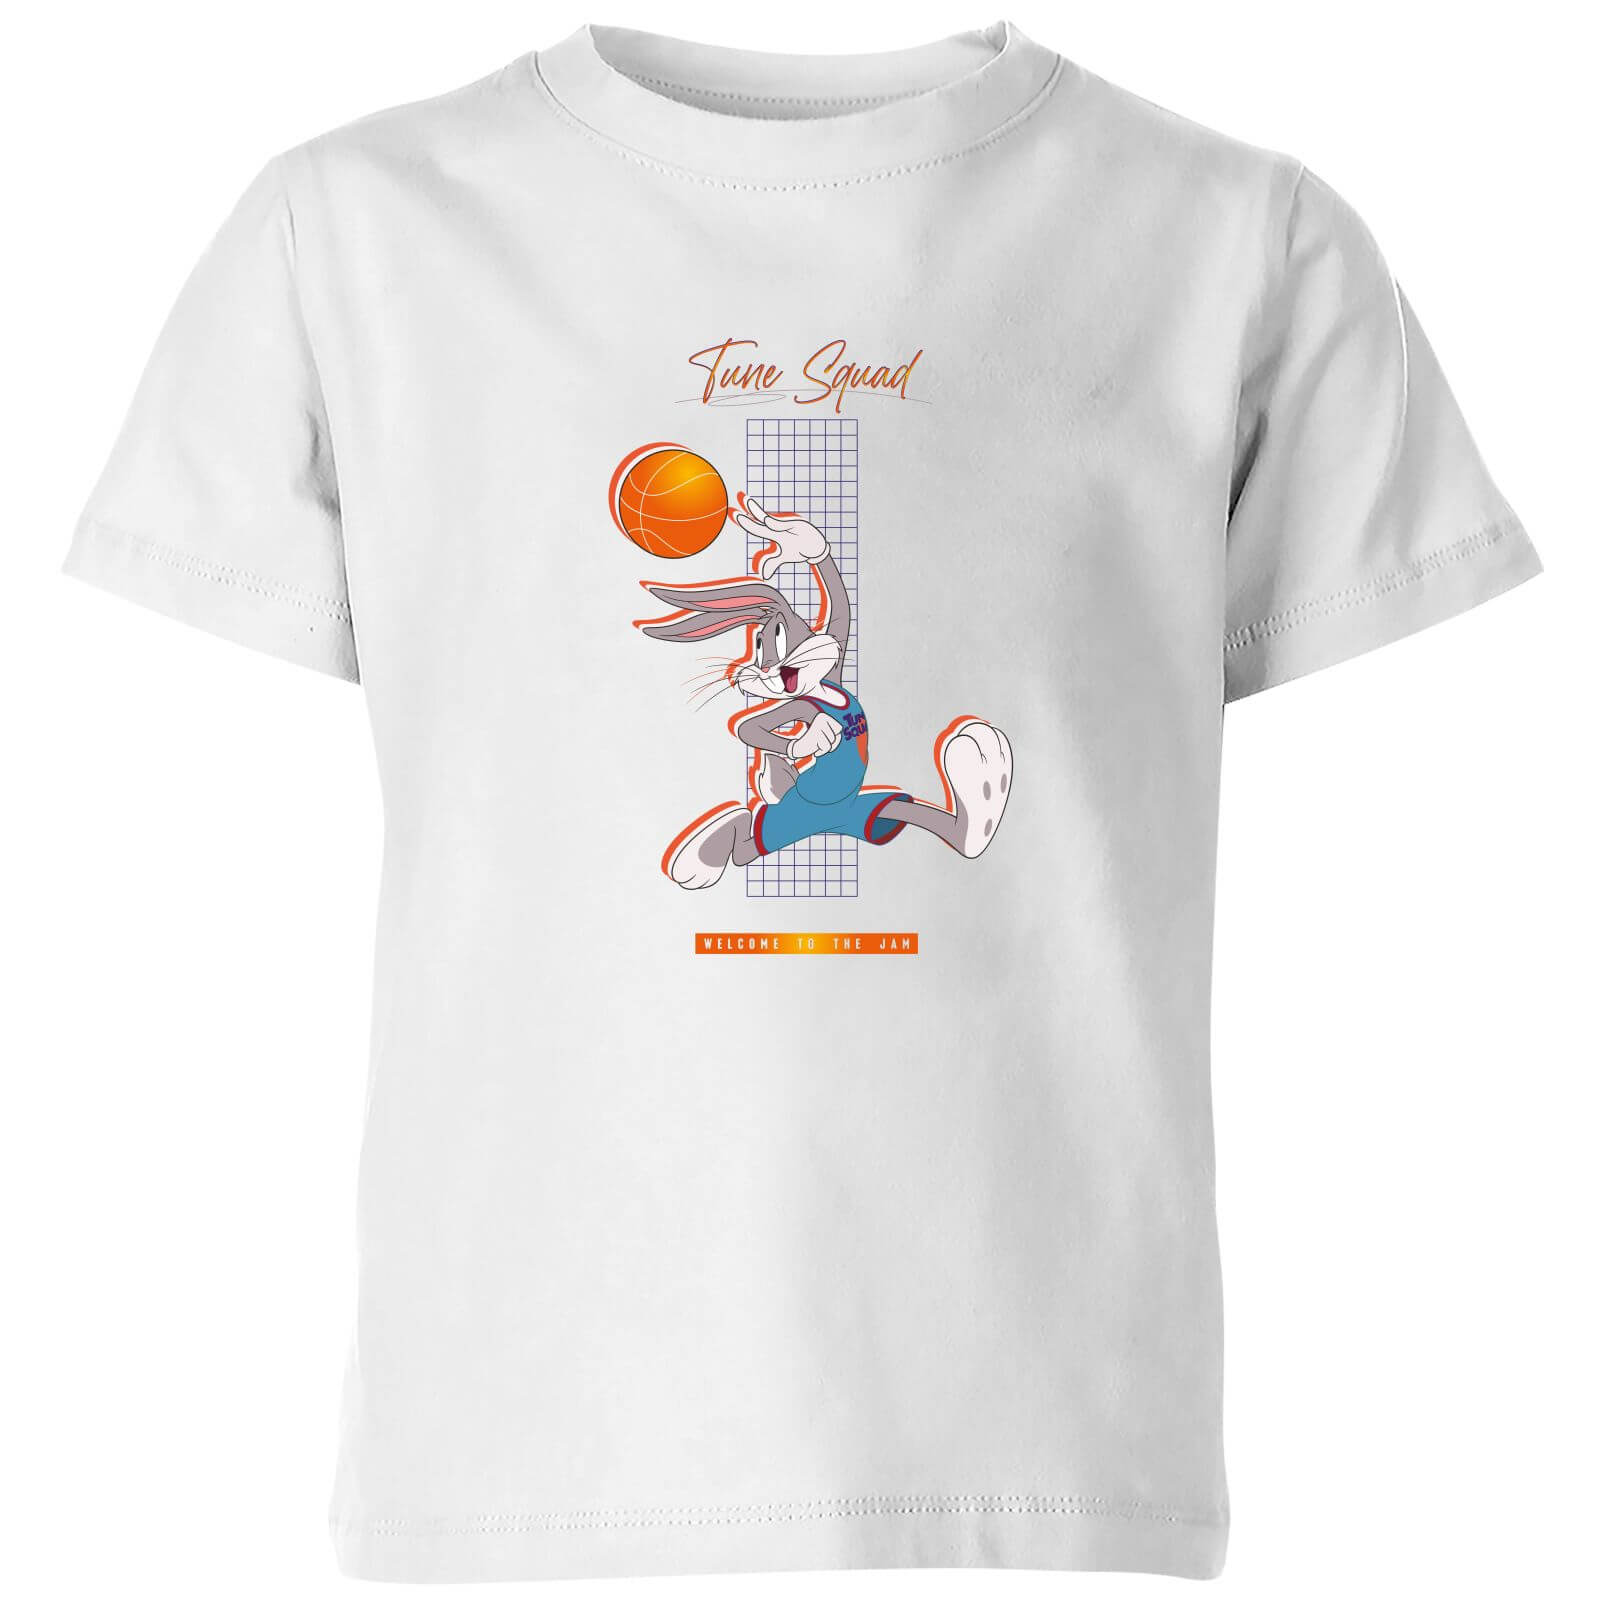 Space Jam Bugs Bunny Basketball Kids' T-Shirt - White - 9-10 Years